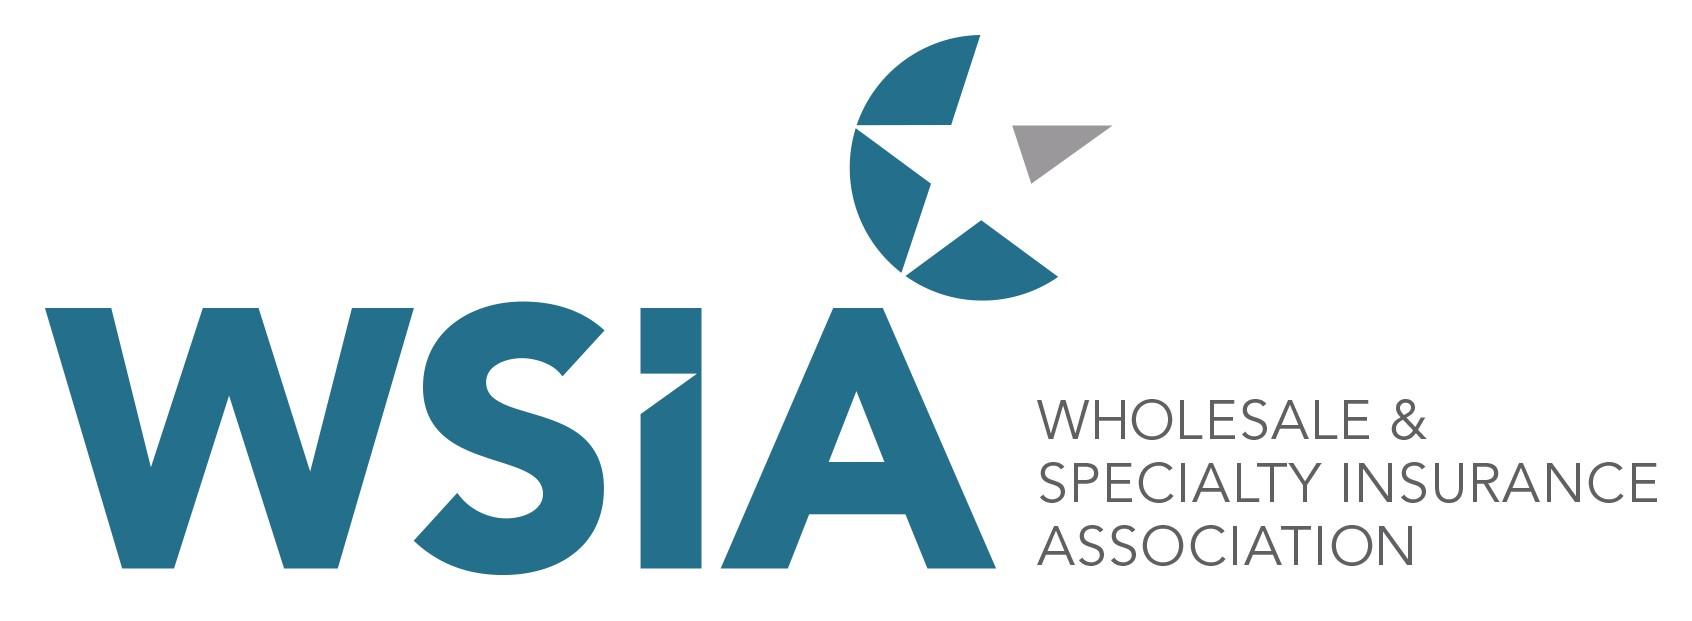 Speaking to power: The impact of WSIA's legislative efforts